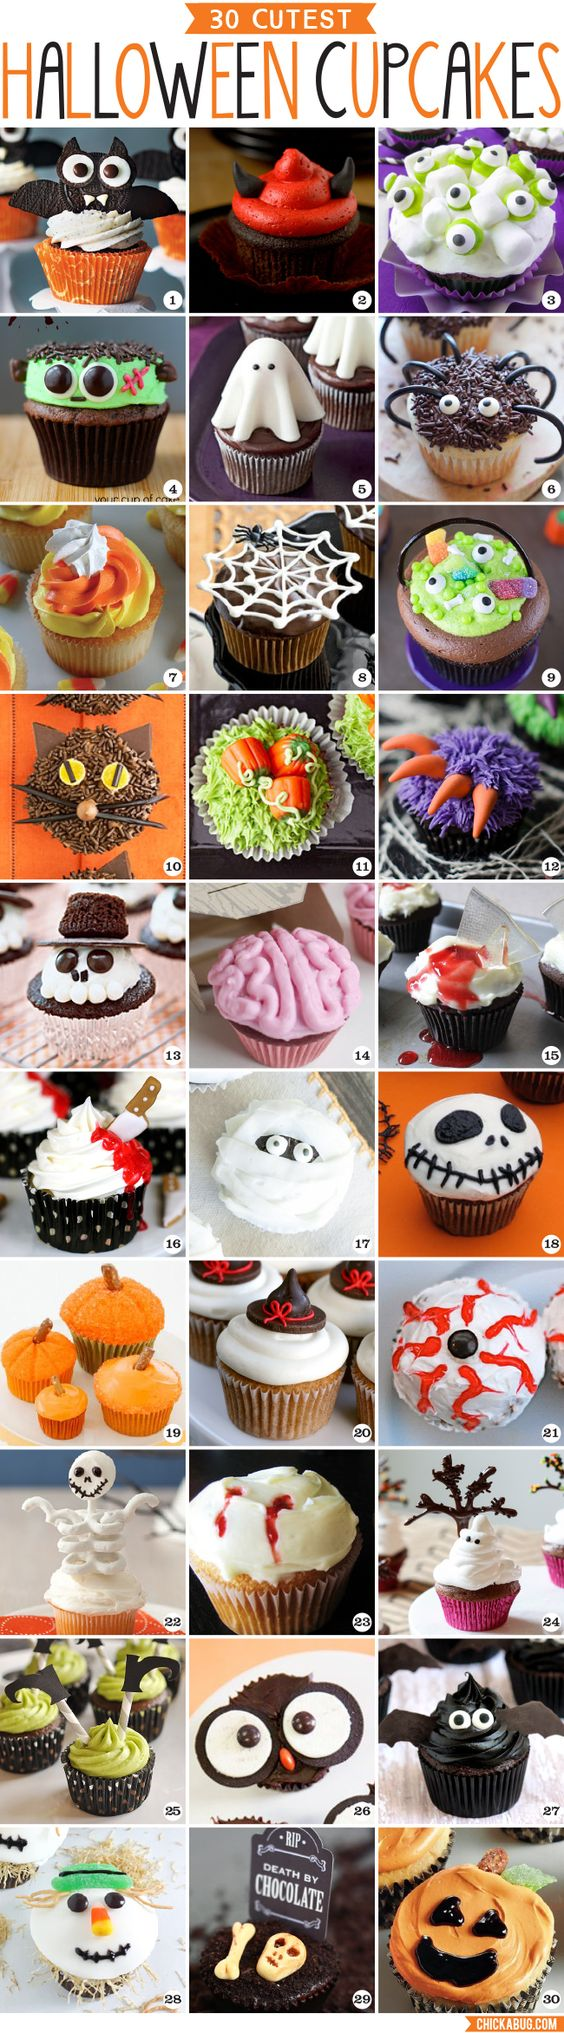 30 Cutest Halloween Cupcakes Devil Cupcake Ideas And